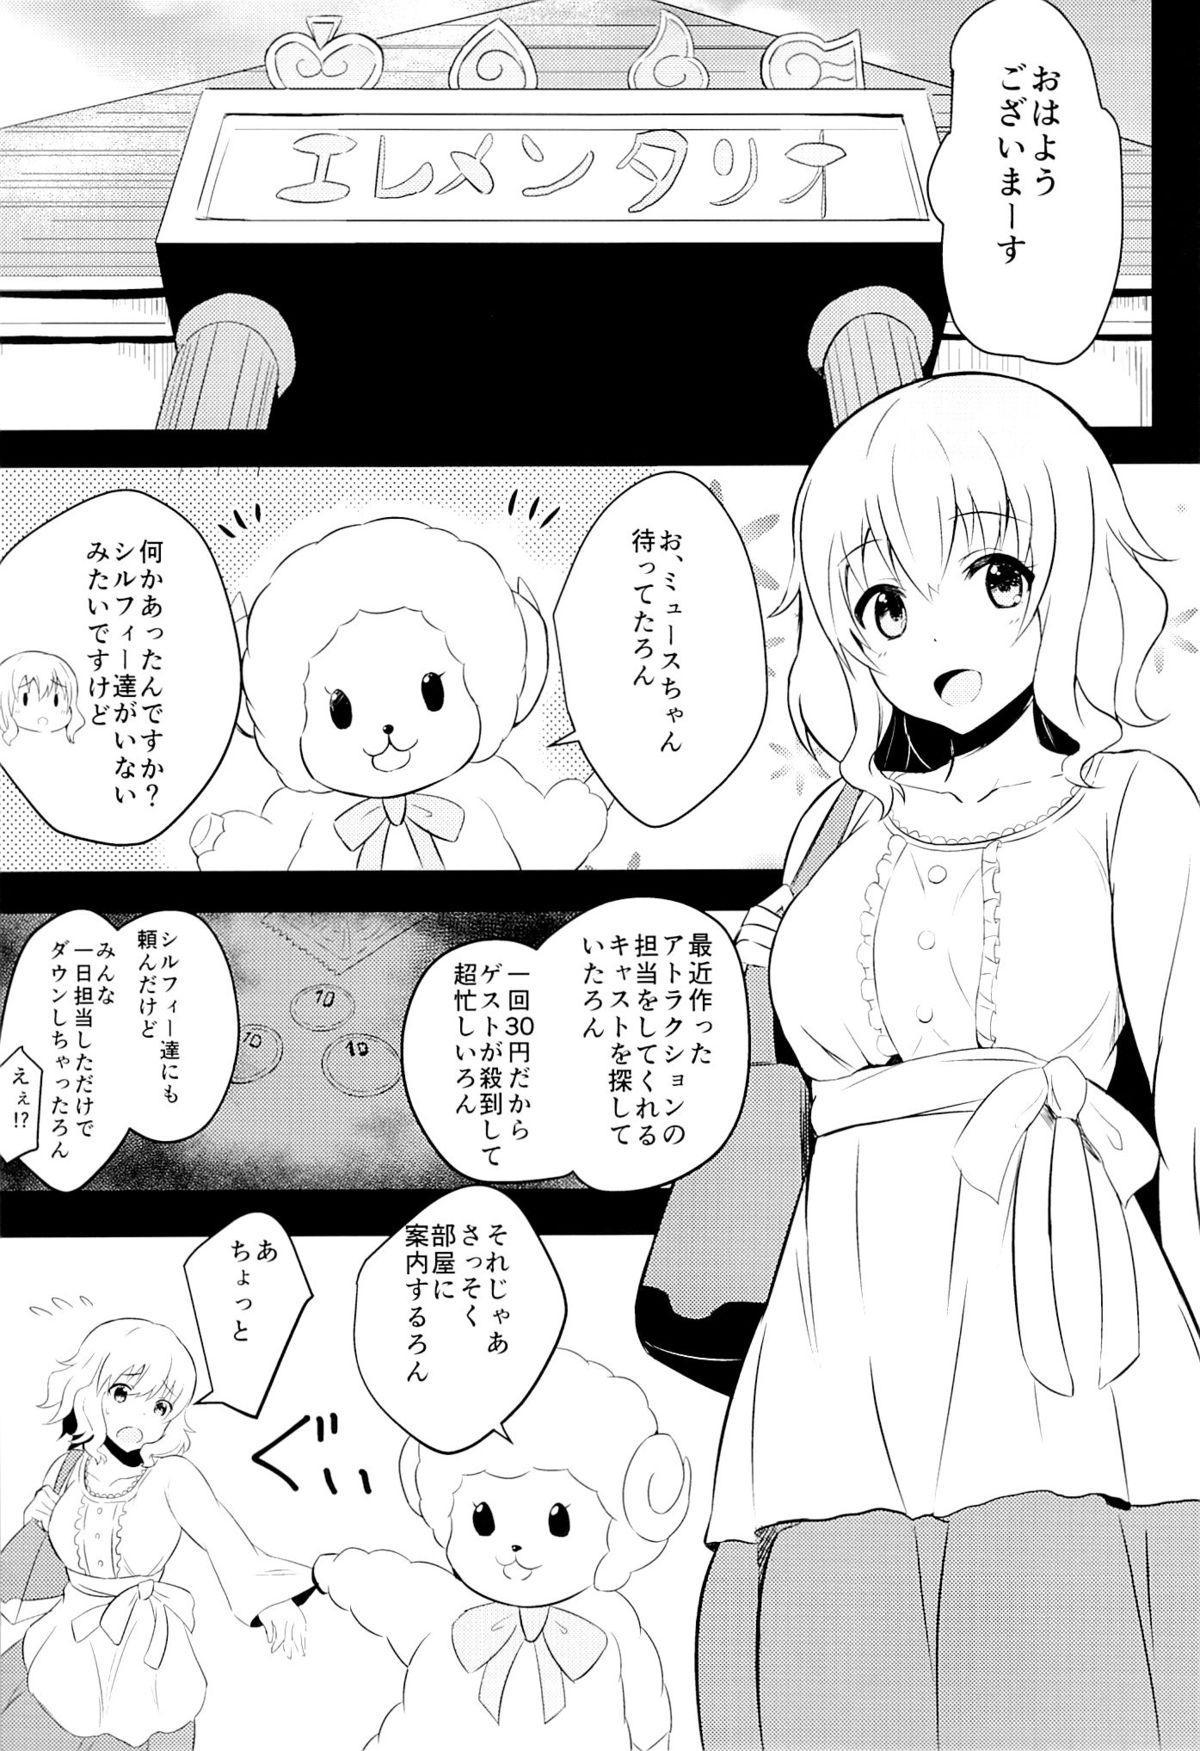 Muse-chan to Issho ni Paffu 3